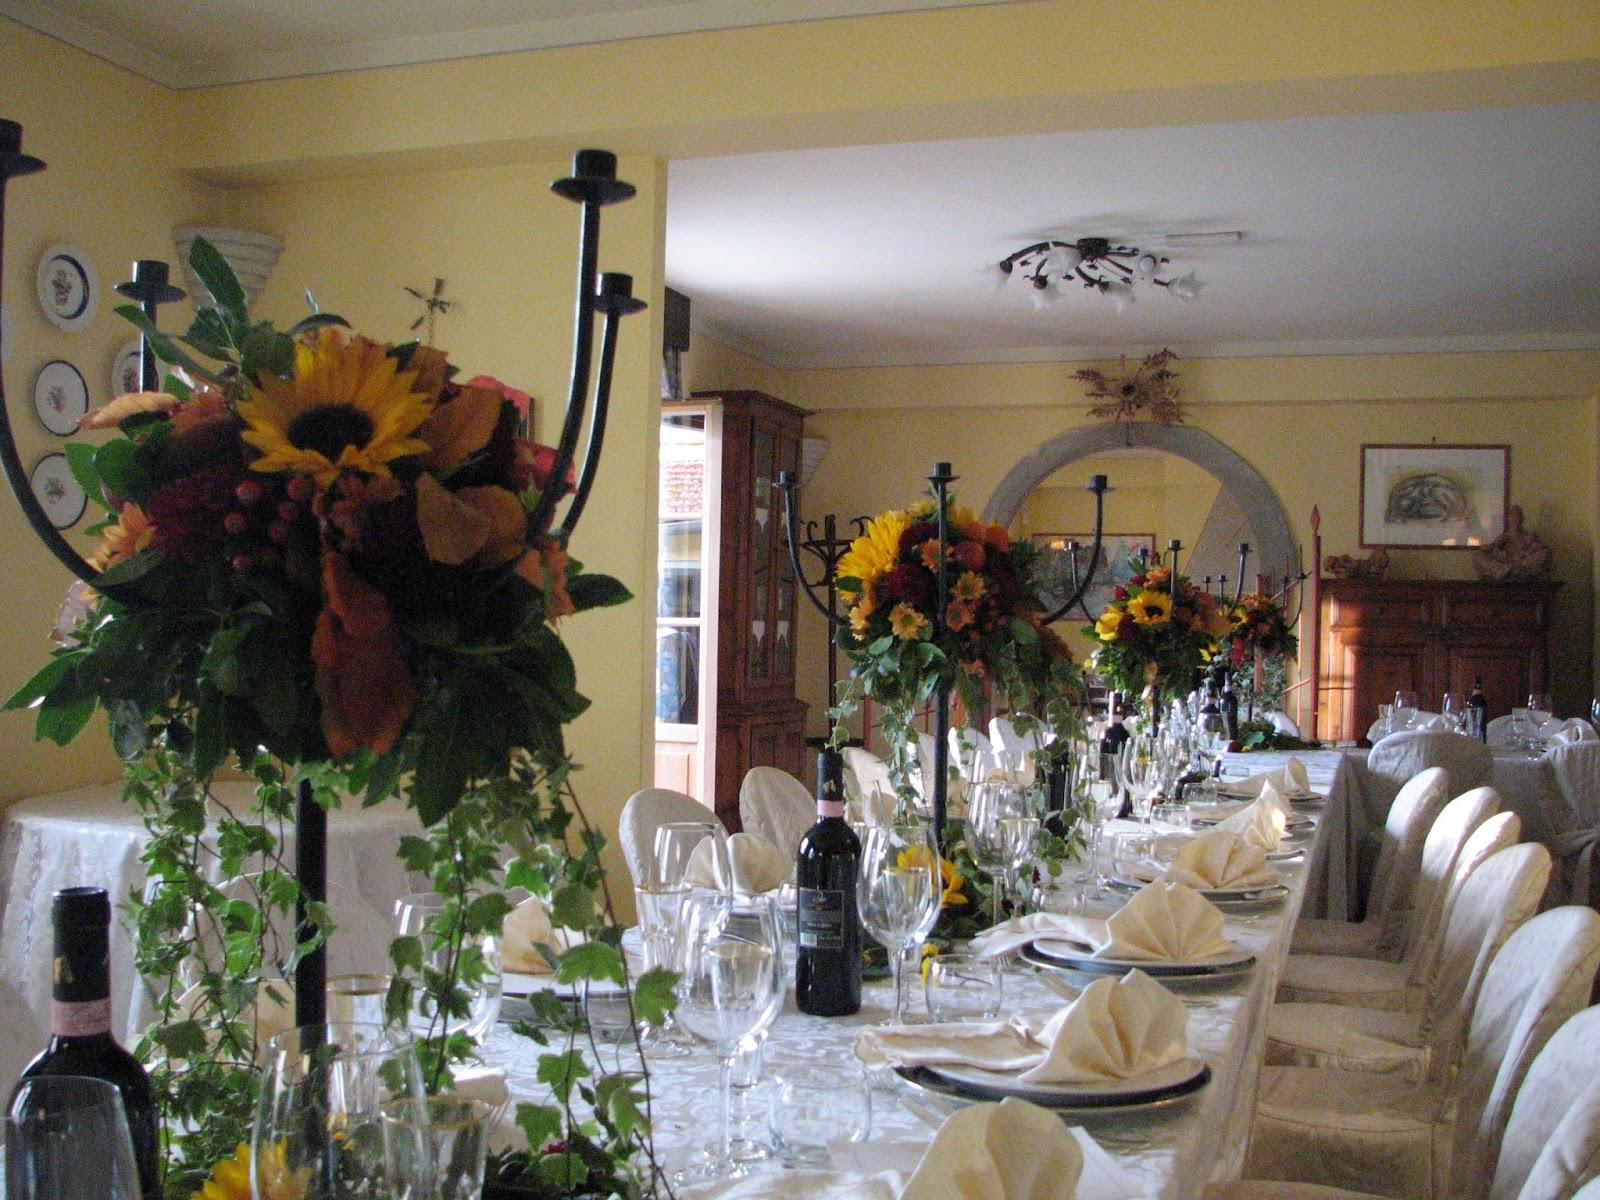 Wedding in Tuscany - Poppi: The Wedding Table settings